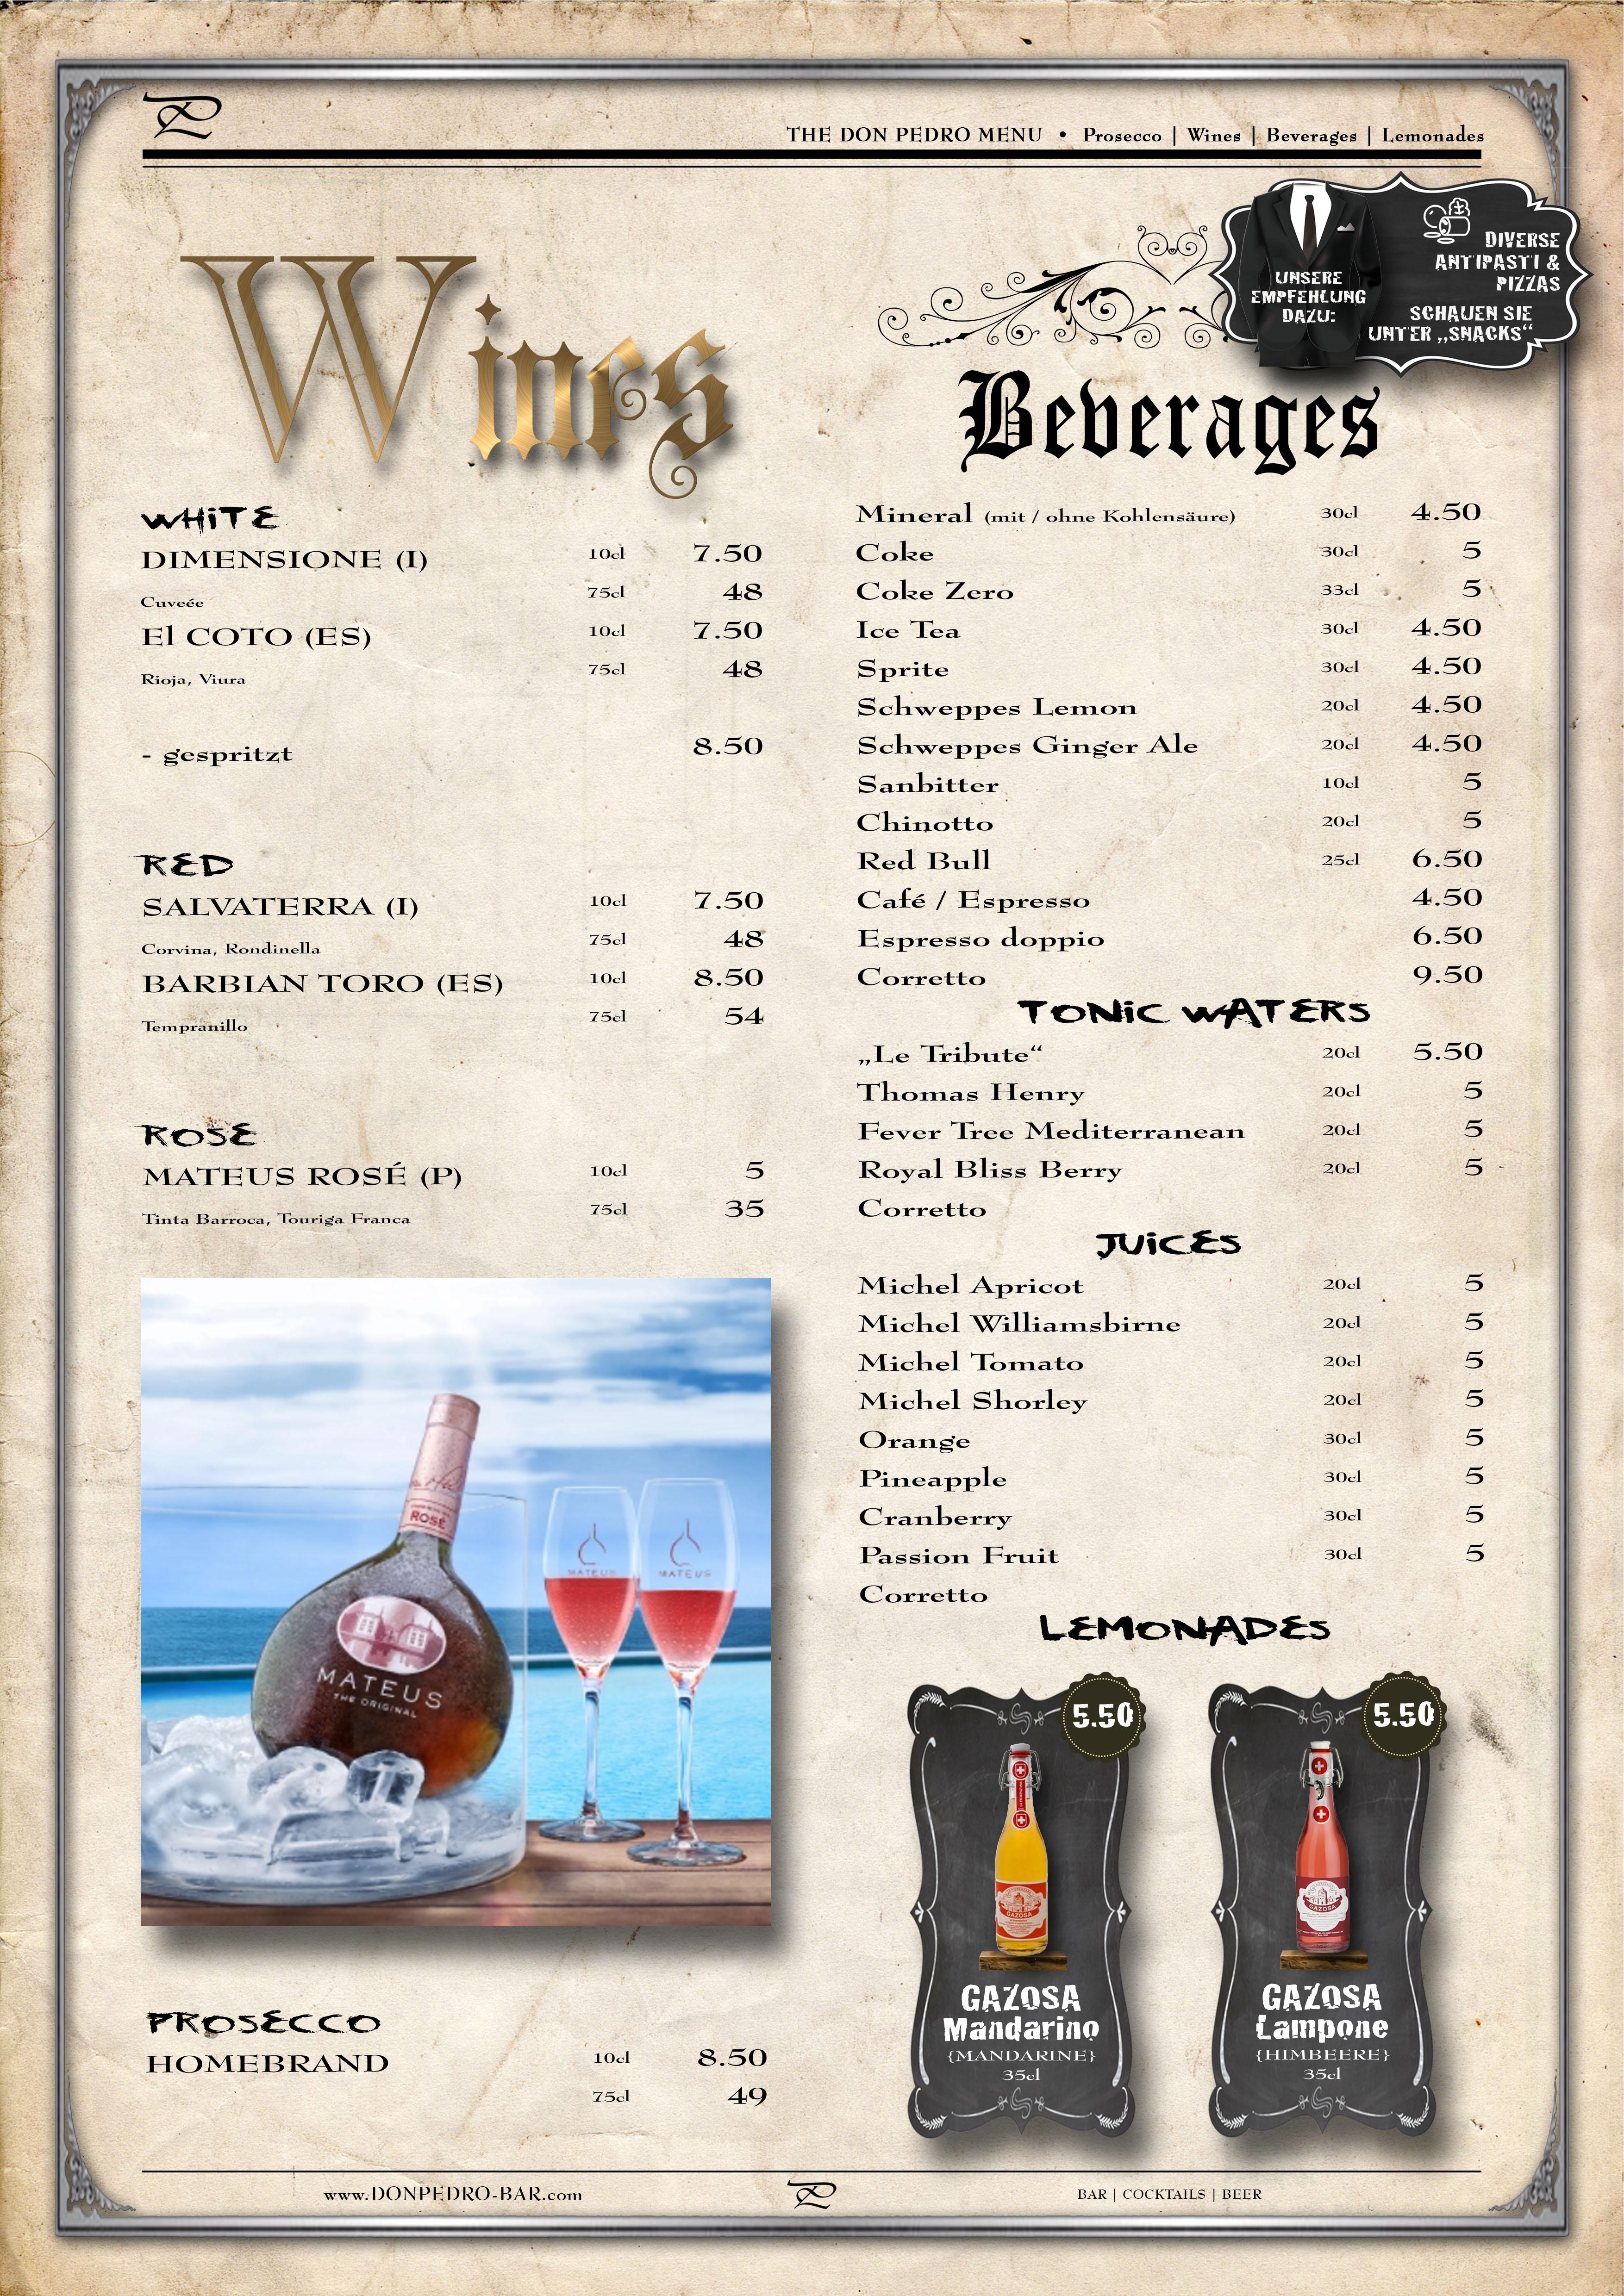 THE DON PEDRO MENU Wines & Beverages